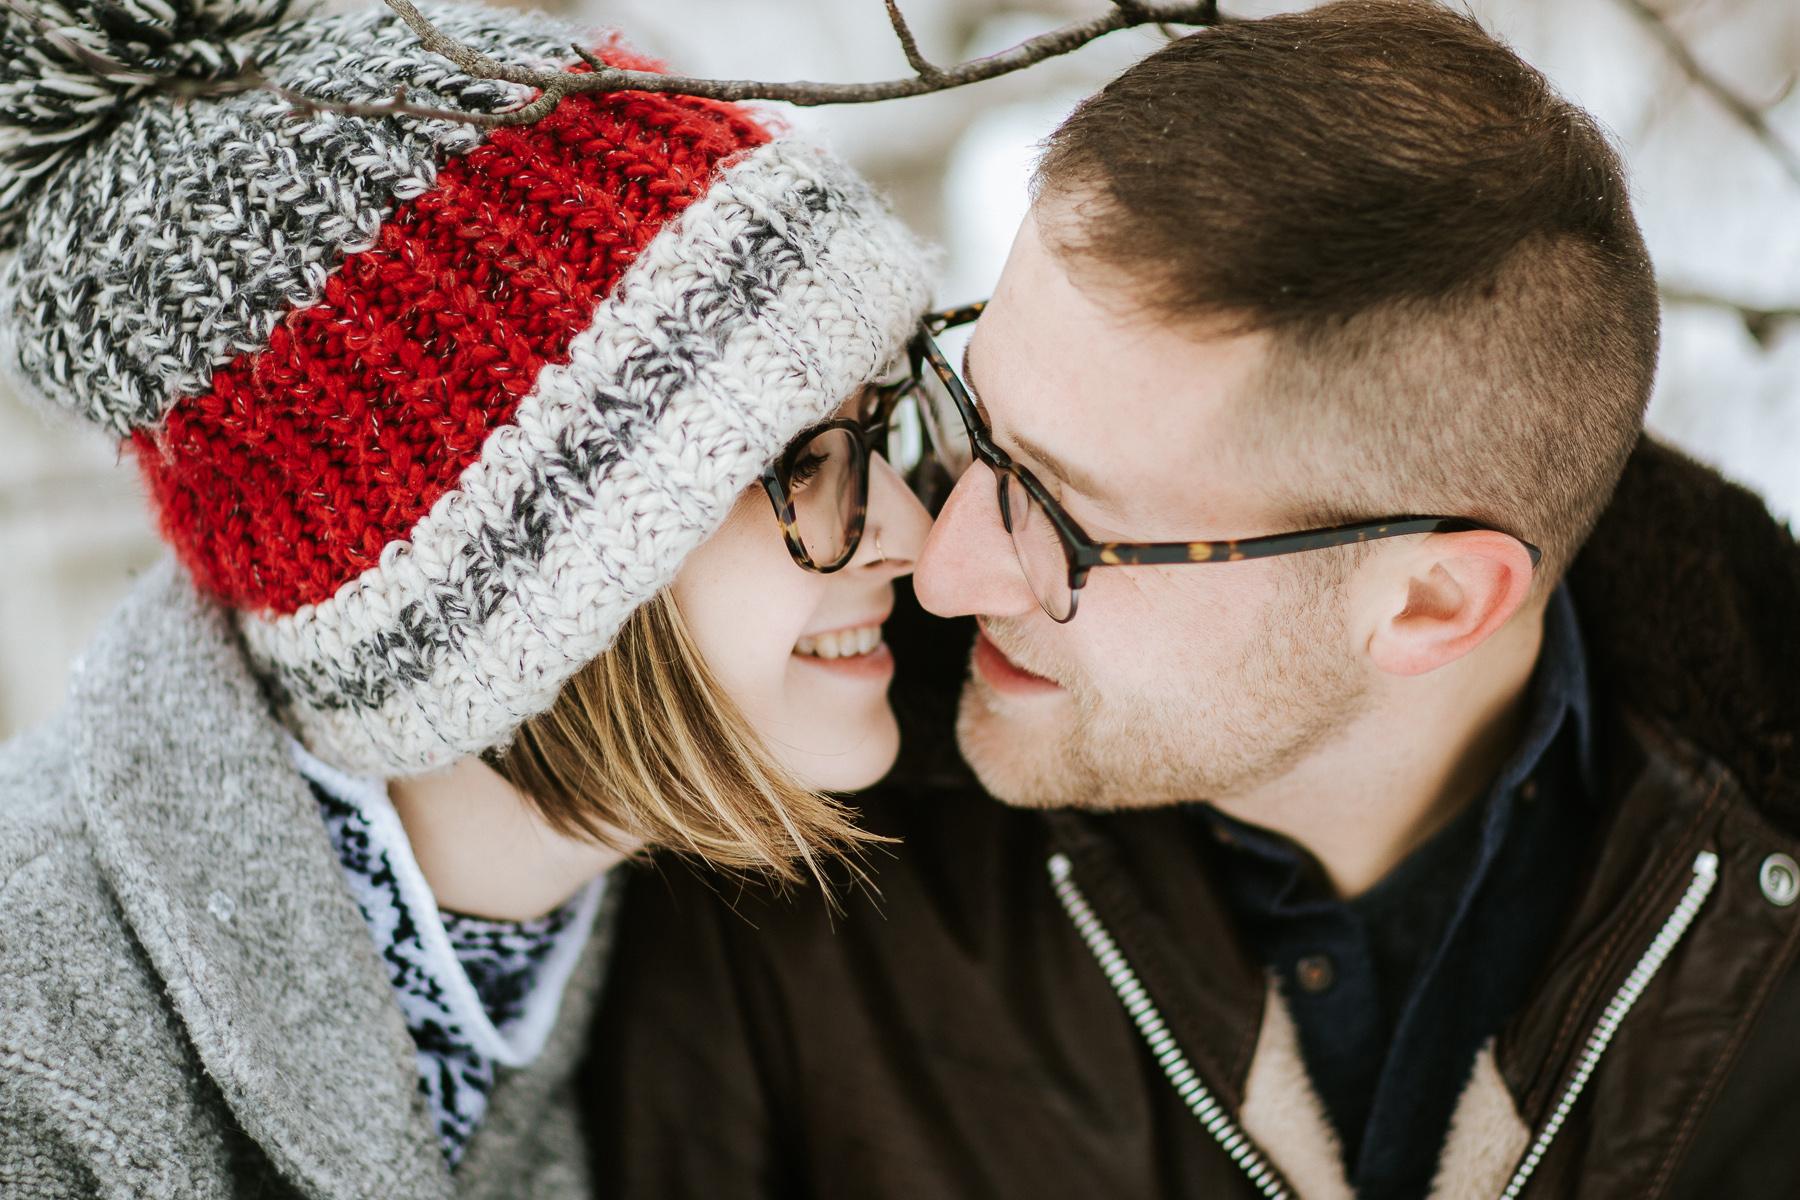 Fun-loving Couple Go For Winter Engagement Photoshoot 1 Avangard Photography Toronto Wedding Photographer